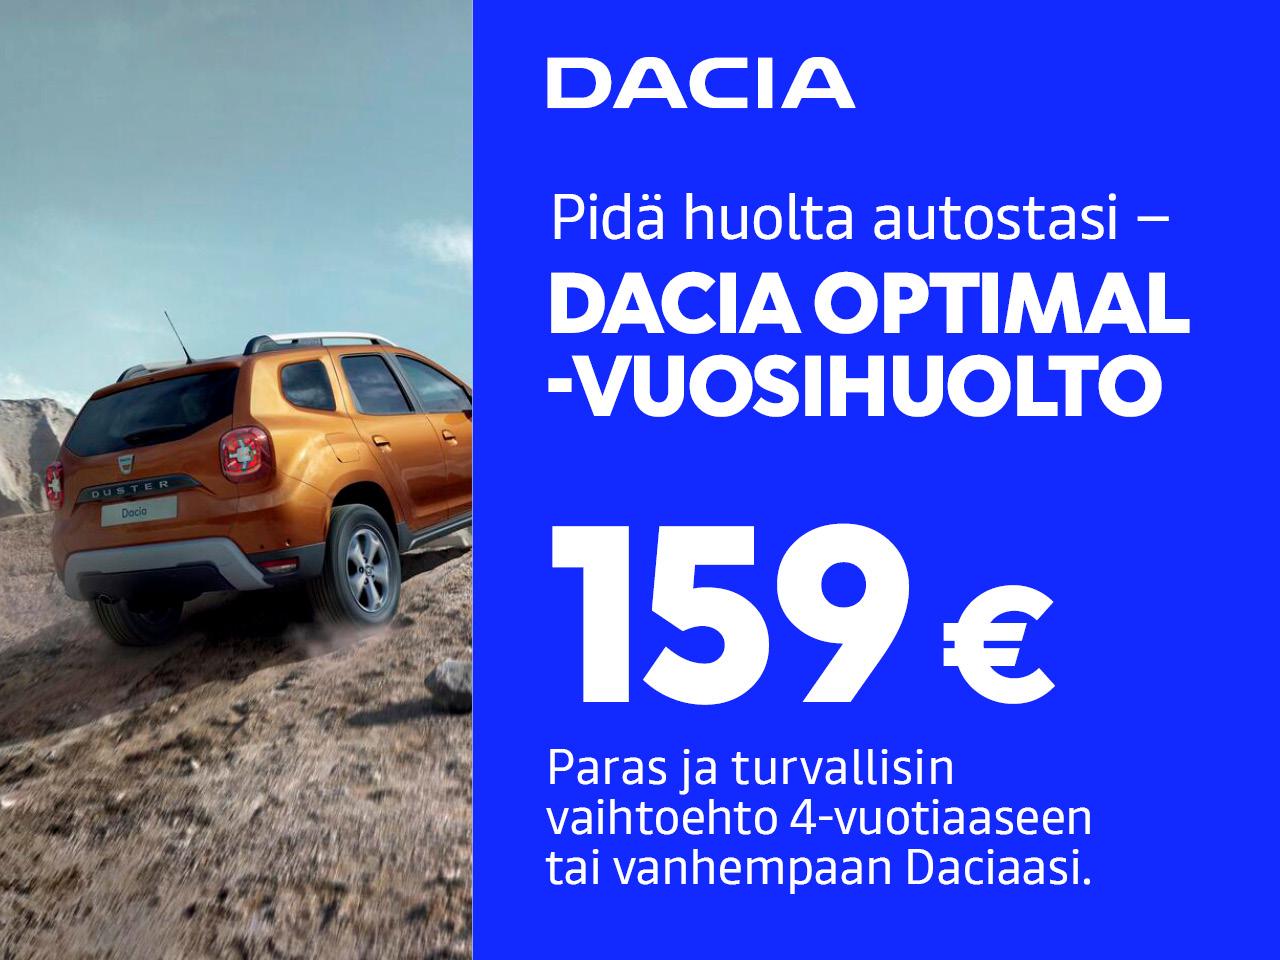 Dacia Optimal -huoltohinta